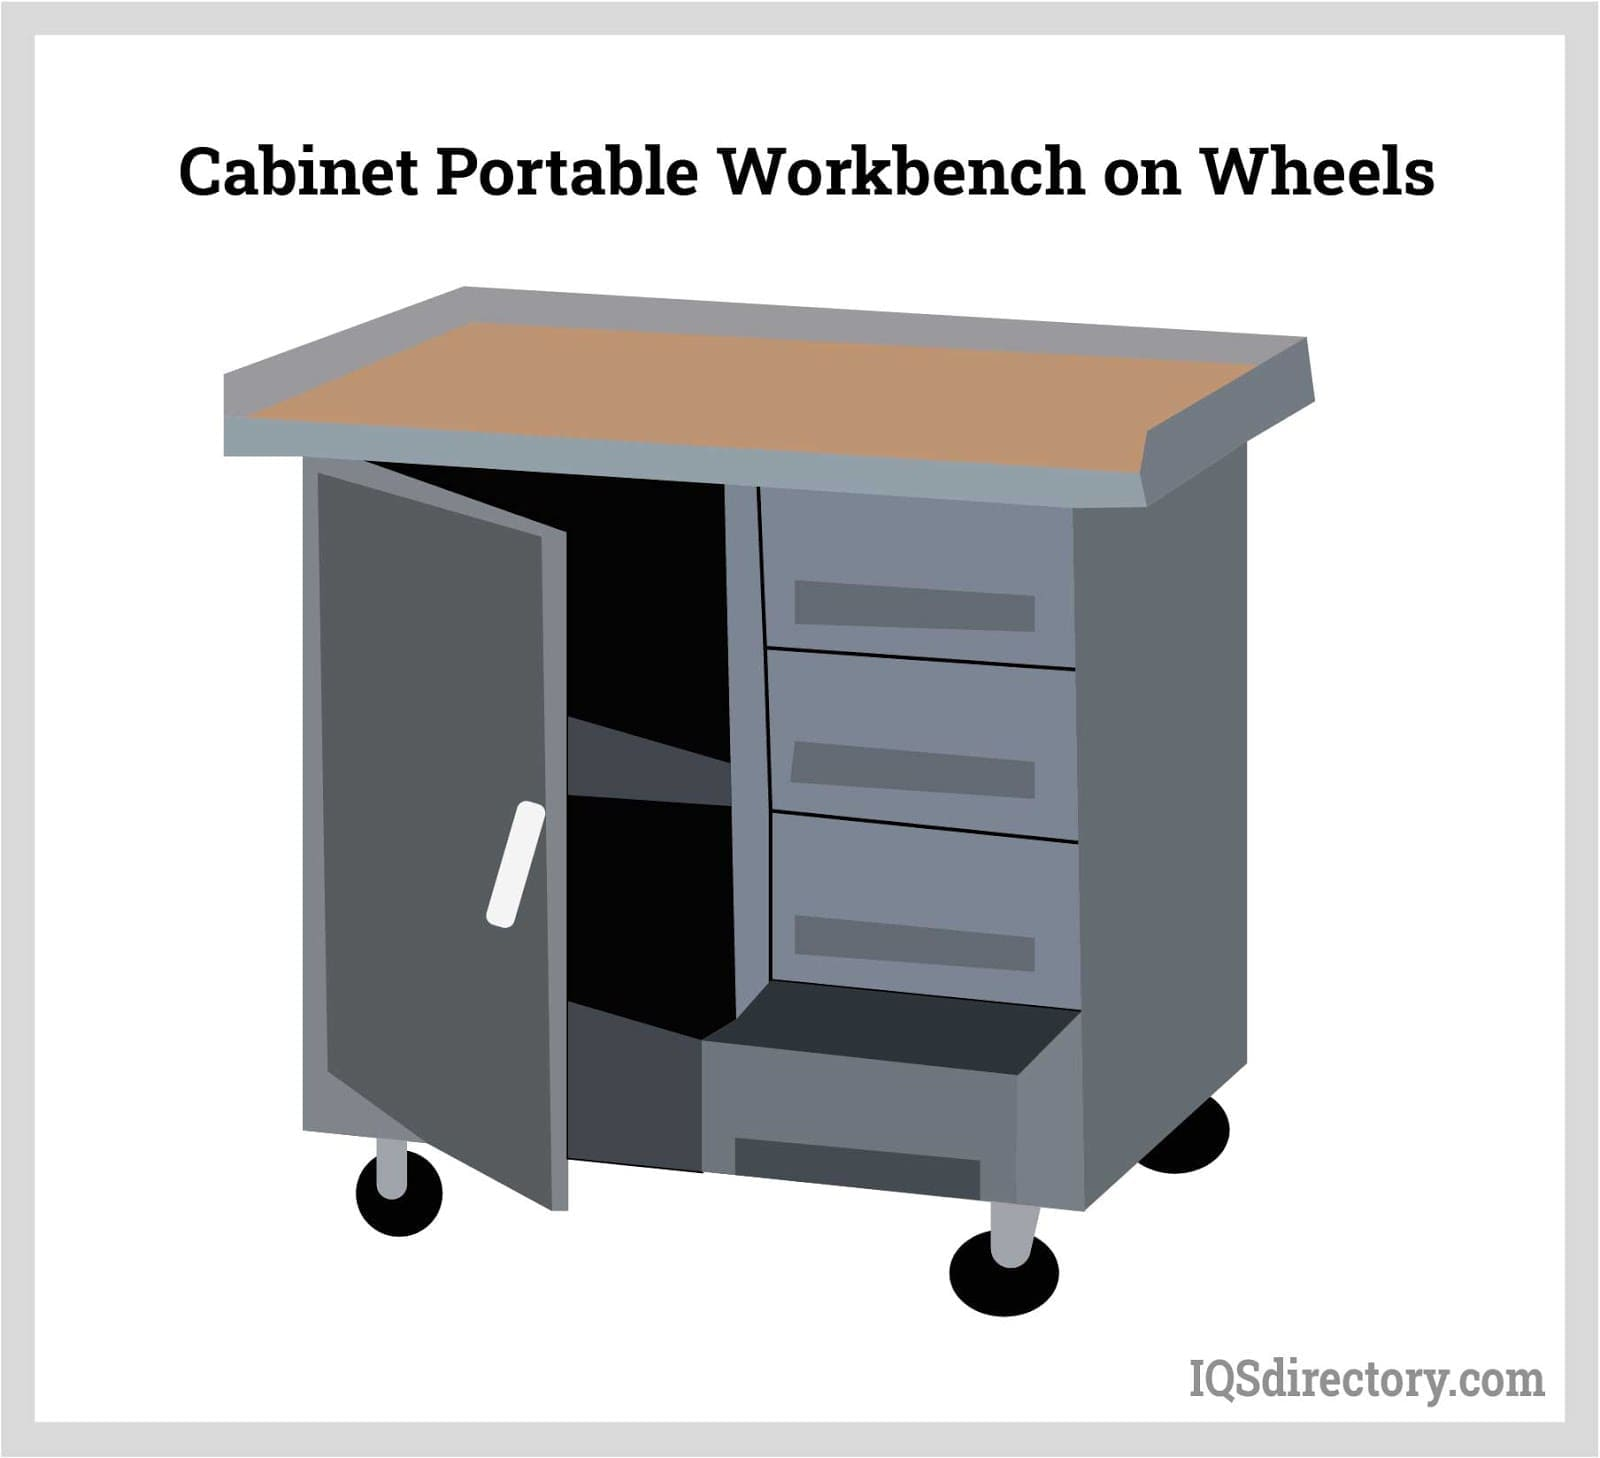 Cabinet Portable Workbench on Wheels